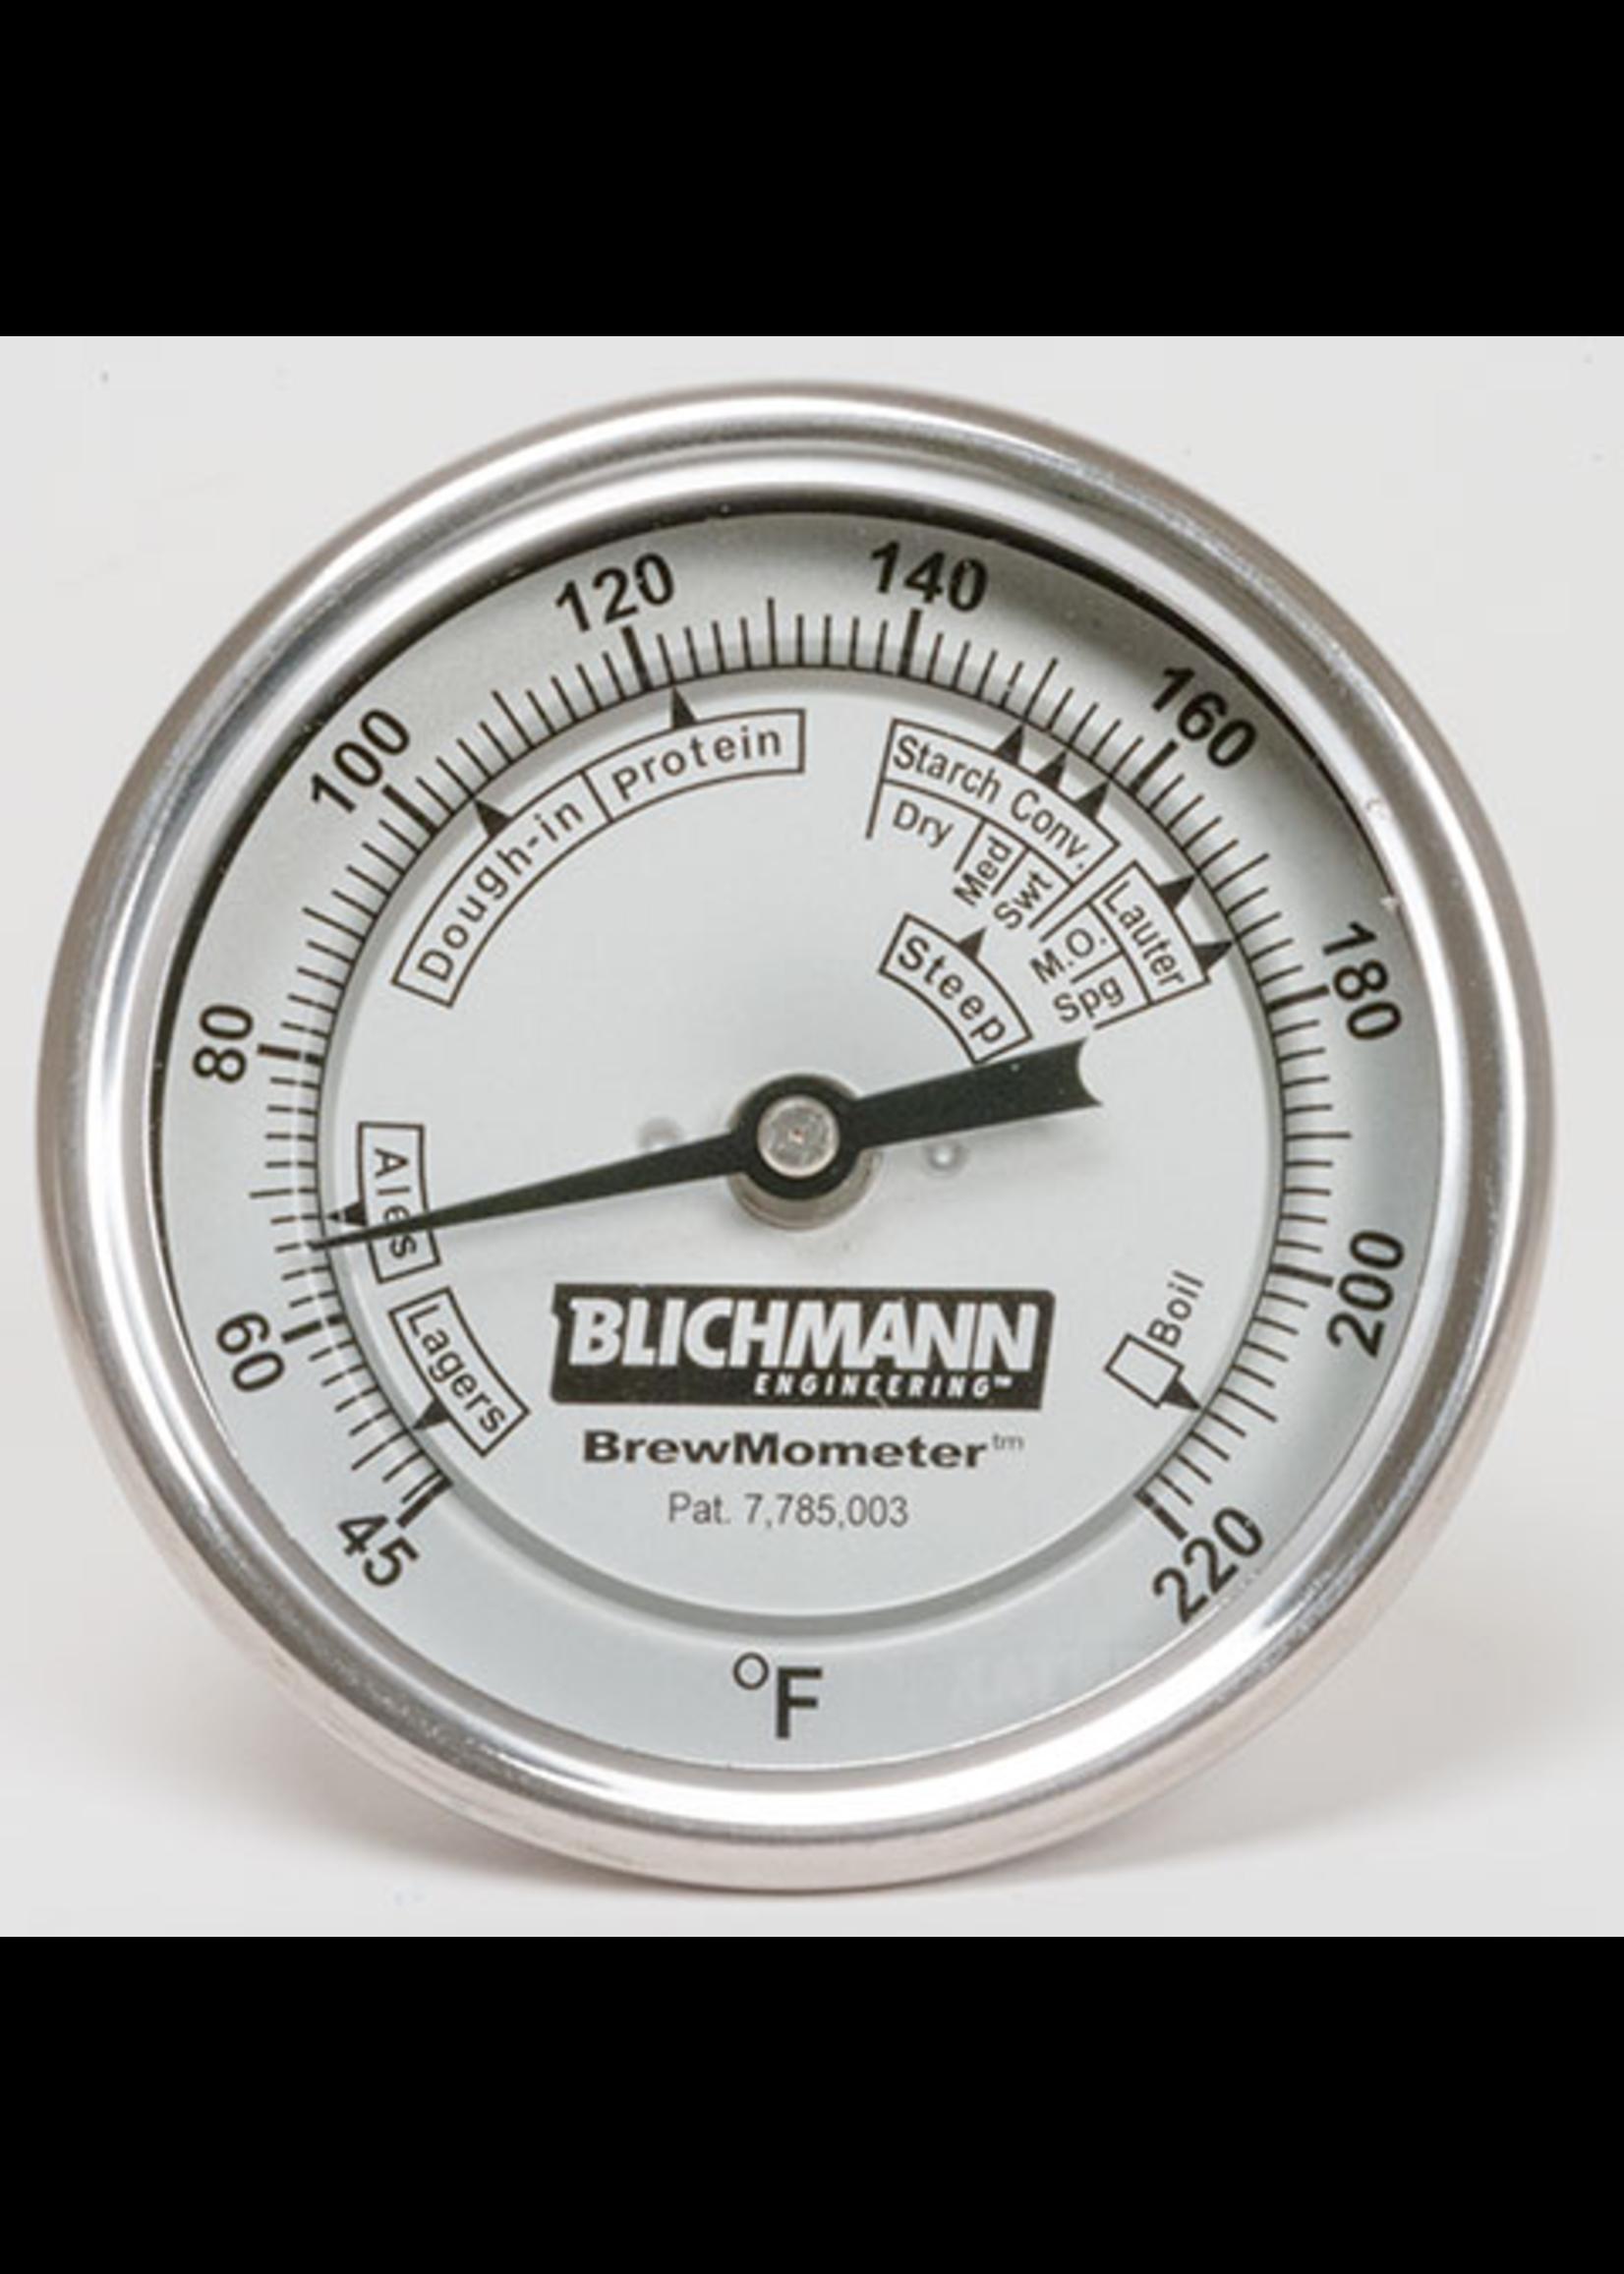 Blichmann Blichmann BrewMometer - Fixed Angle Weldless (Fahrenheit)